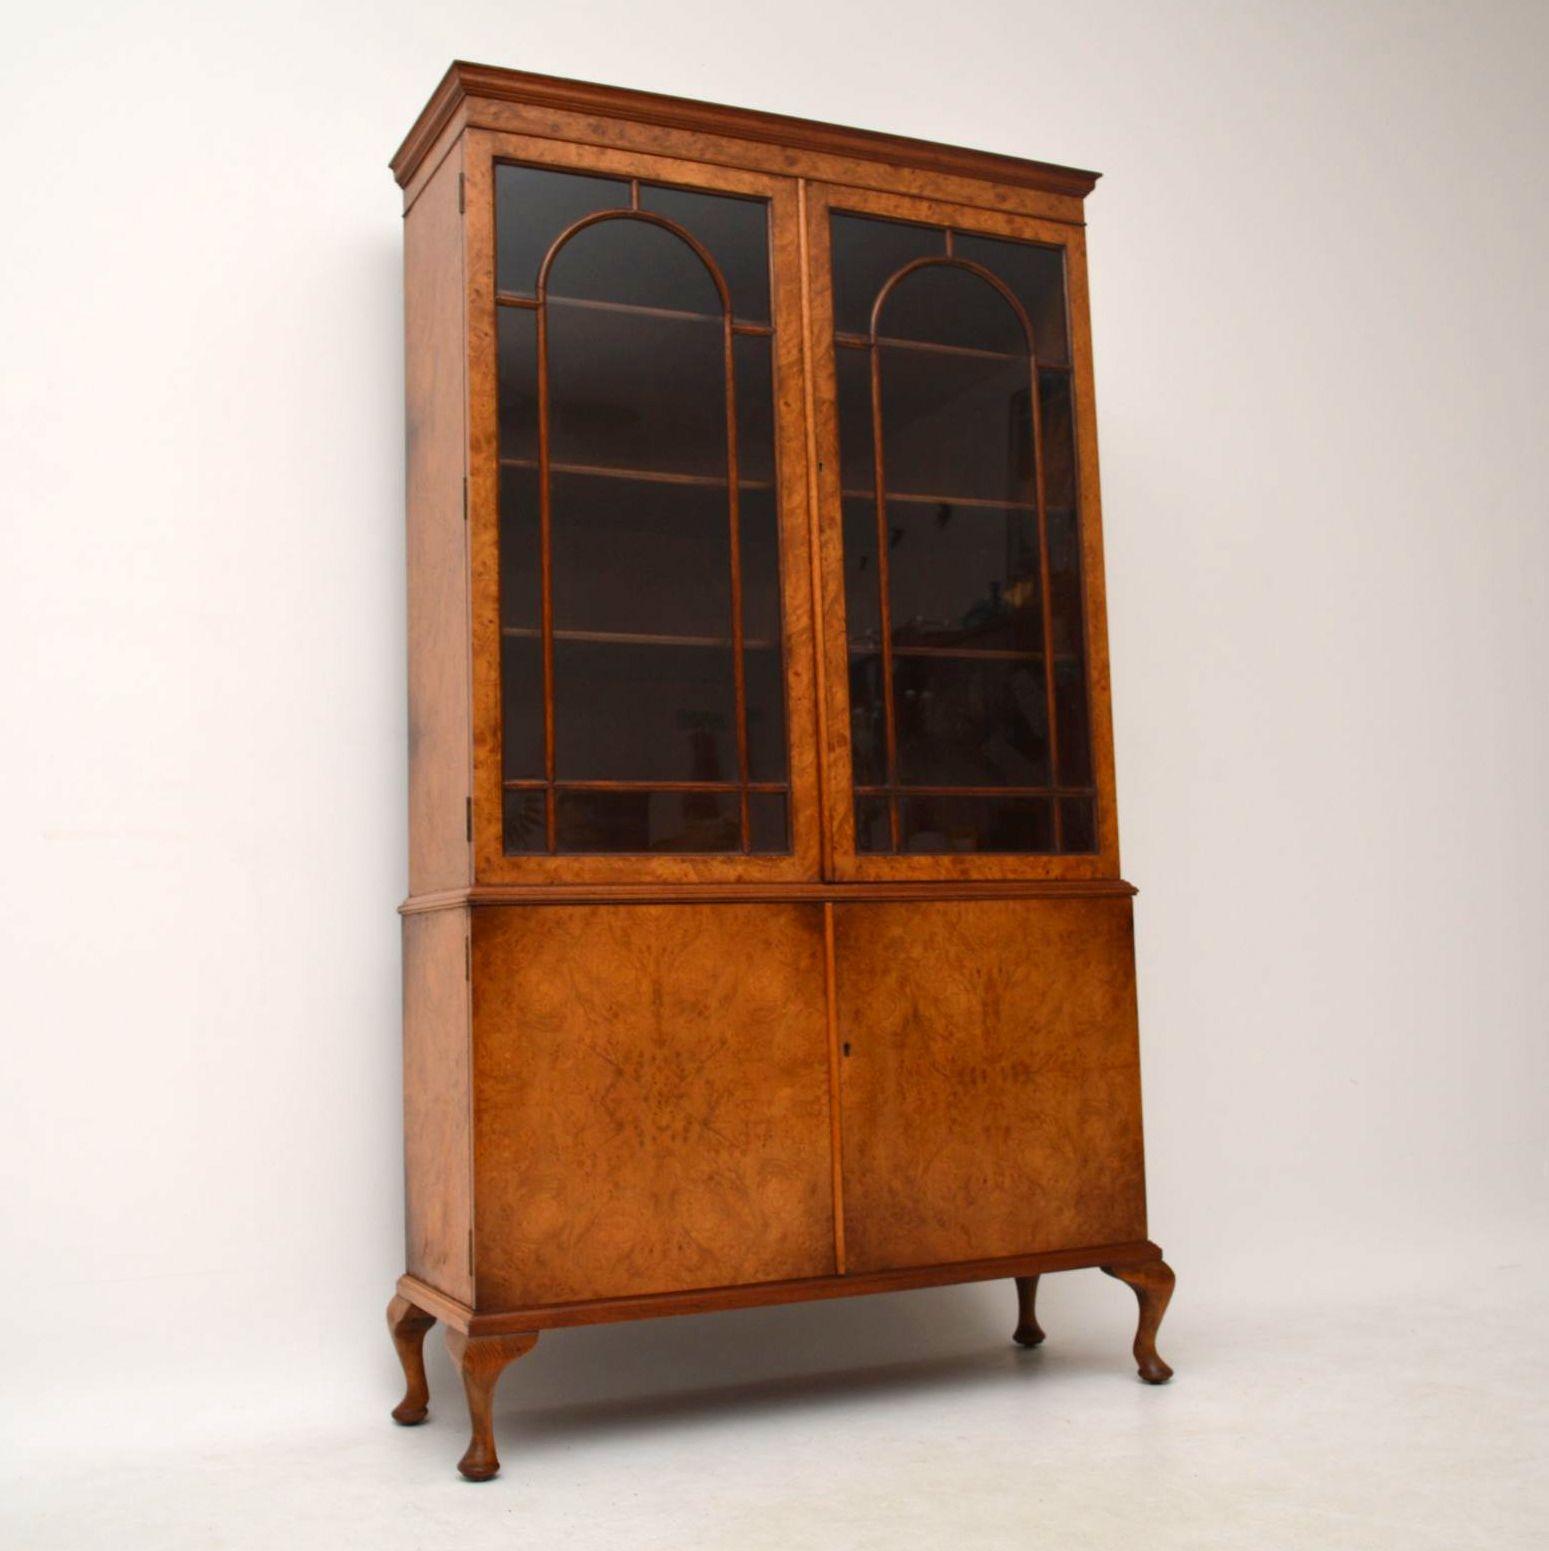 antik burr walnuss b cherregal schrank mit showcase vitrine. Black Bedroom Furniture Sets. Home Design Ideas